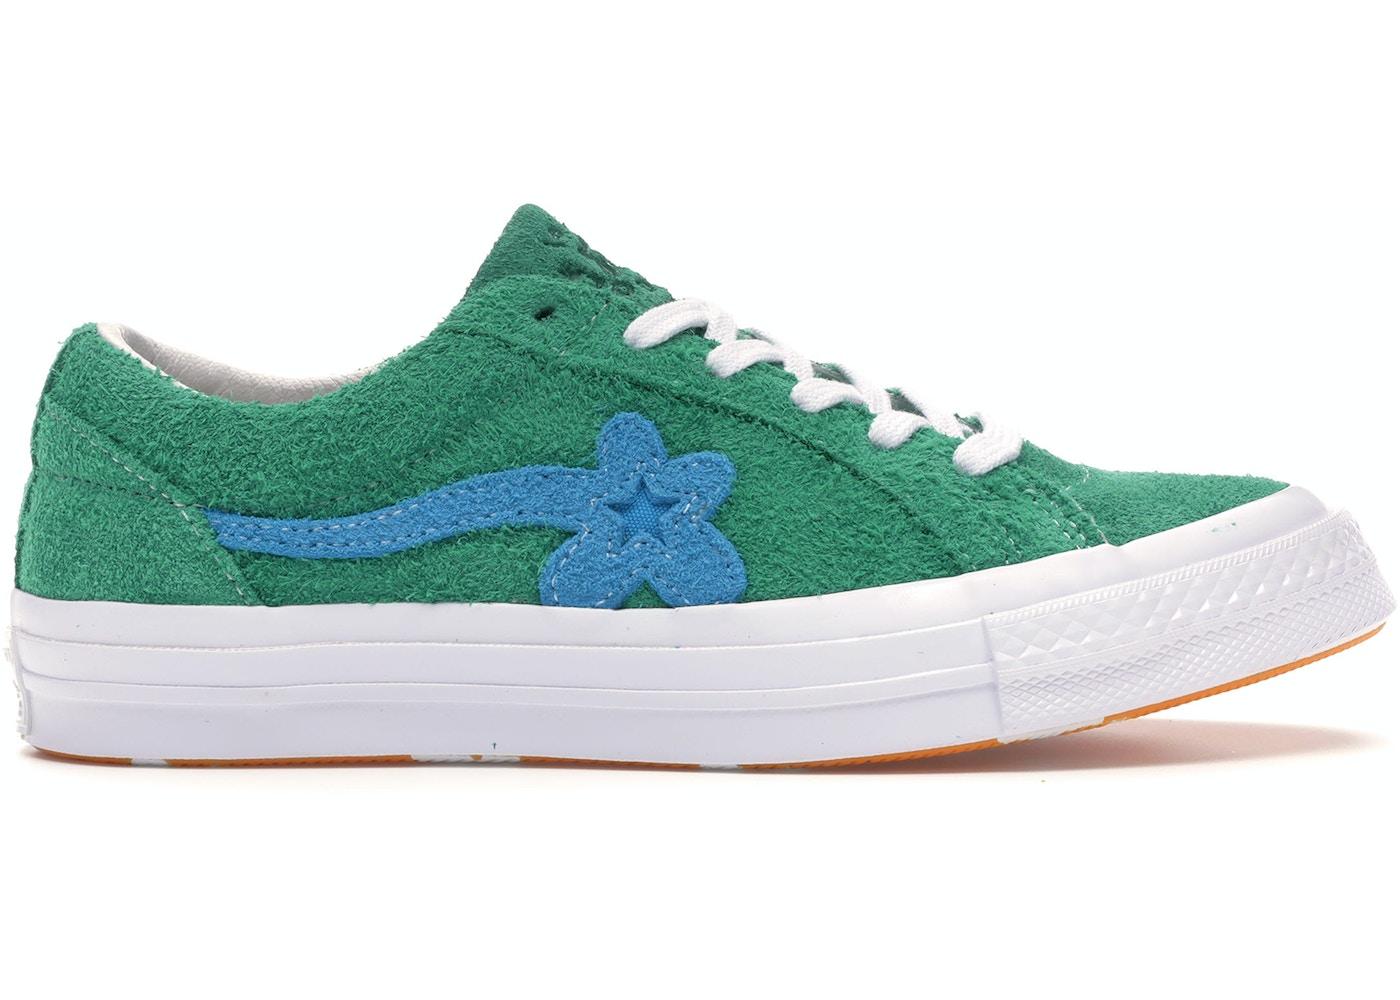 Converse One Star Ox Tyler The Creator Golf Le Fleur Jolly Green 160322c